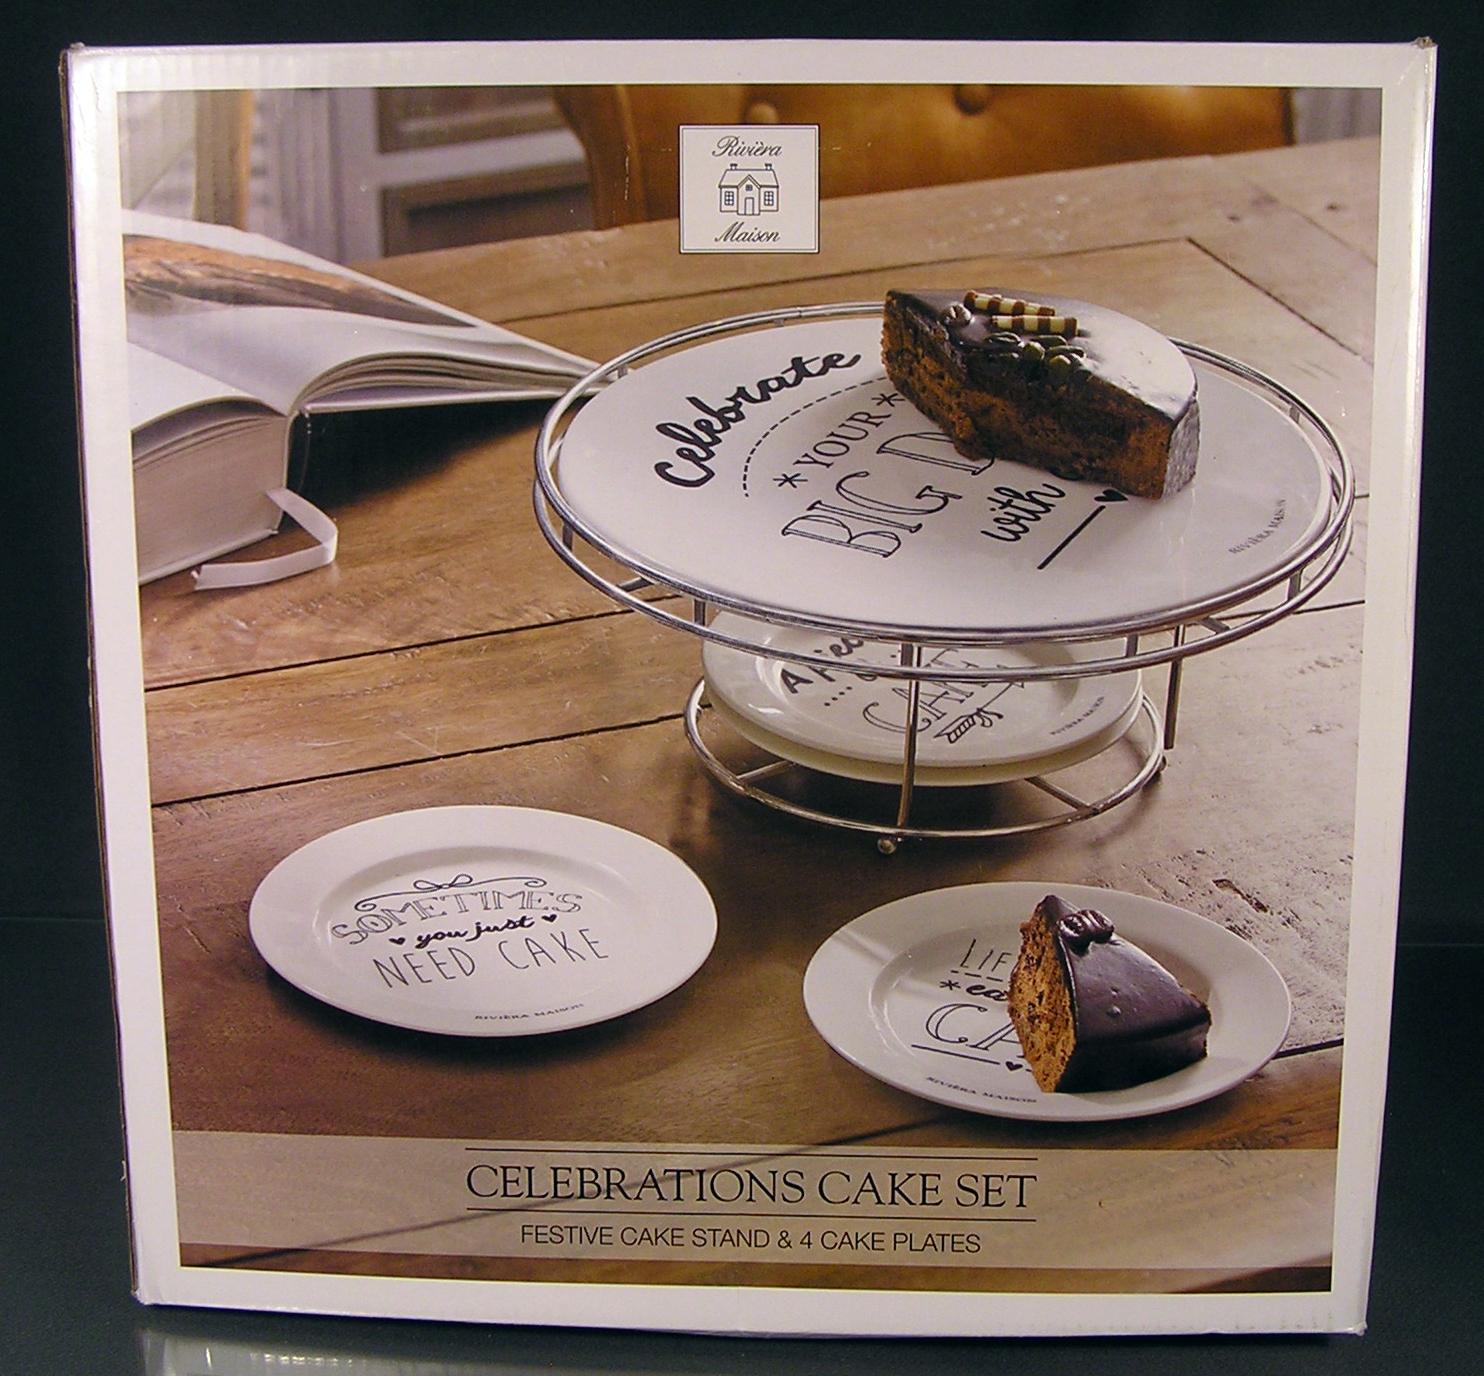 riviera maison celebrations cake set porzellan tortenplatte 4 teller ovp neu ebay. Black Bedroom Furniture Sets. Home Design Ideas